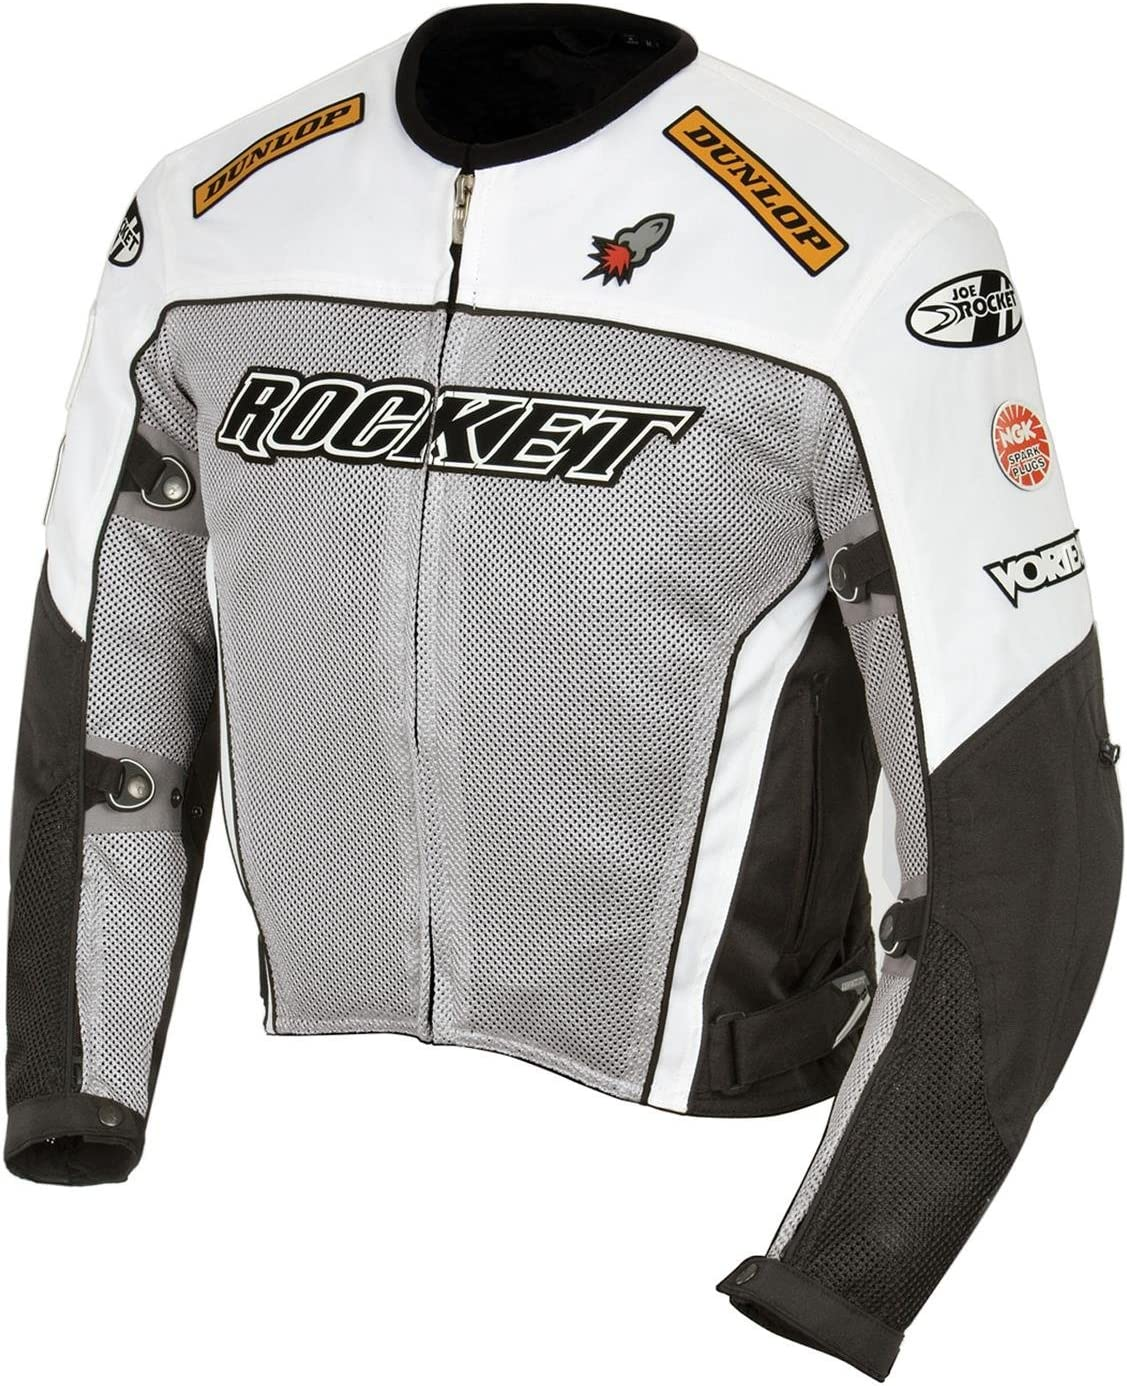 Joe Rocket UFO 2.0 Best Mesh Motorcycle Jacket